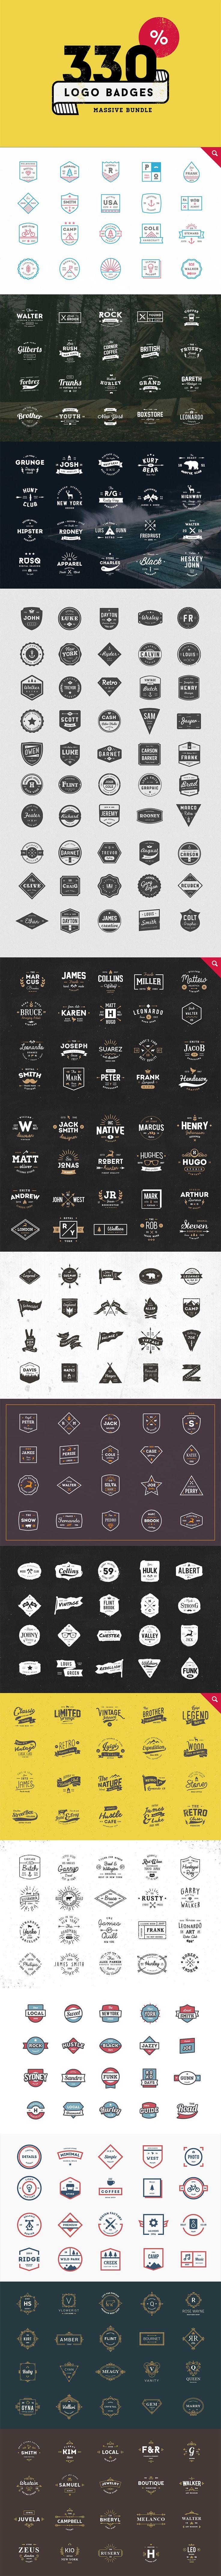 https://creativemarket.com/vuuuds/206973-330-Logos-Bundle